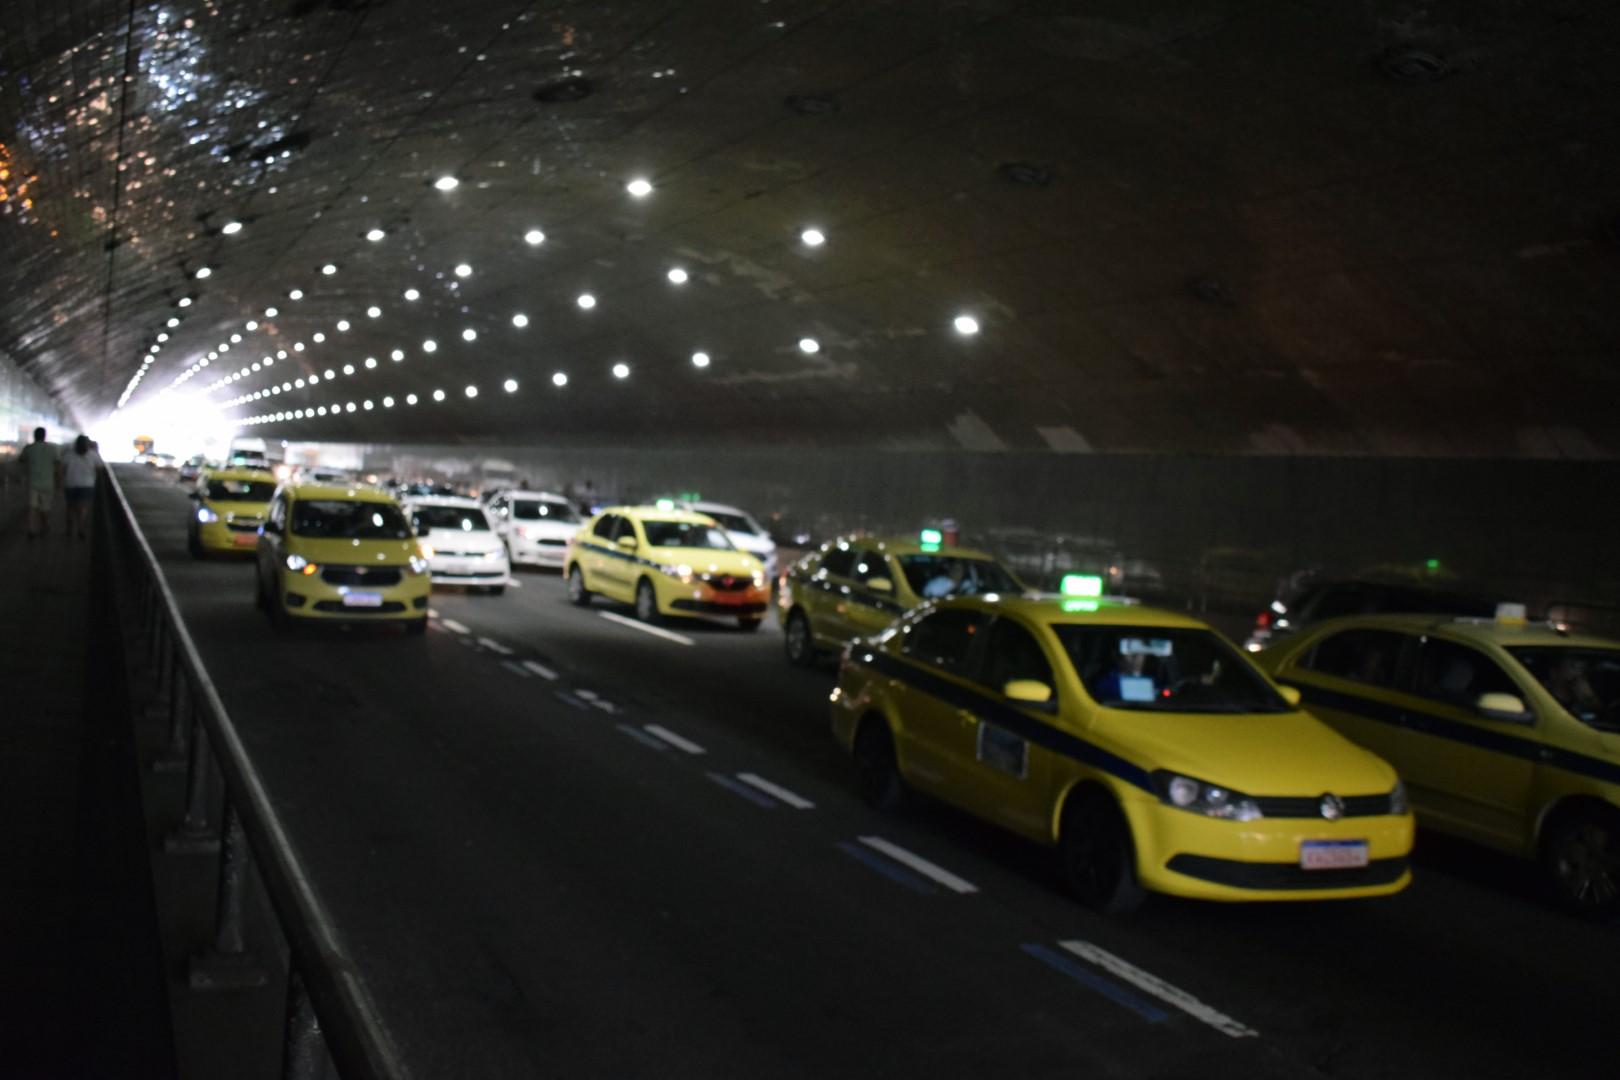 Túnel Eng. Marquês Pôrto, Humaitá, Rio de Janeiro